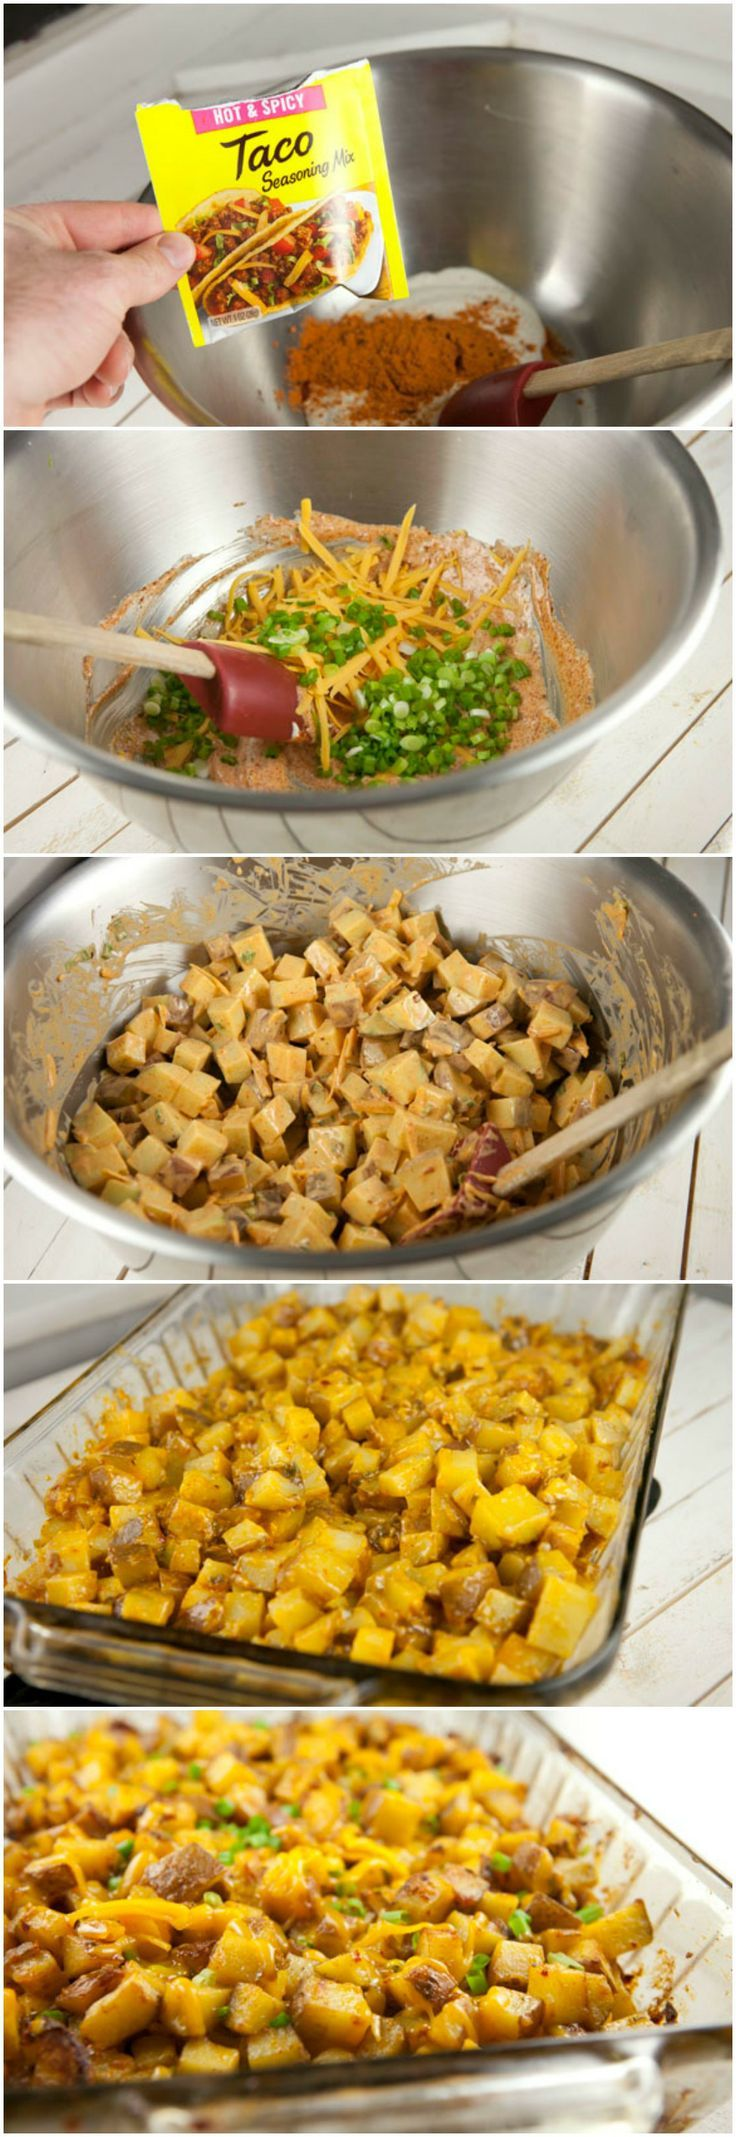 Tex-Mex Ranch Potatoes: 2 lb potatoes, 2 Tb taco seasoning, 1/2 c ranch dressing, 1/2 c cheddar cheese, 1/2 c crumbled bacon, 4 green onions.